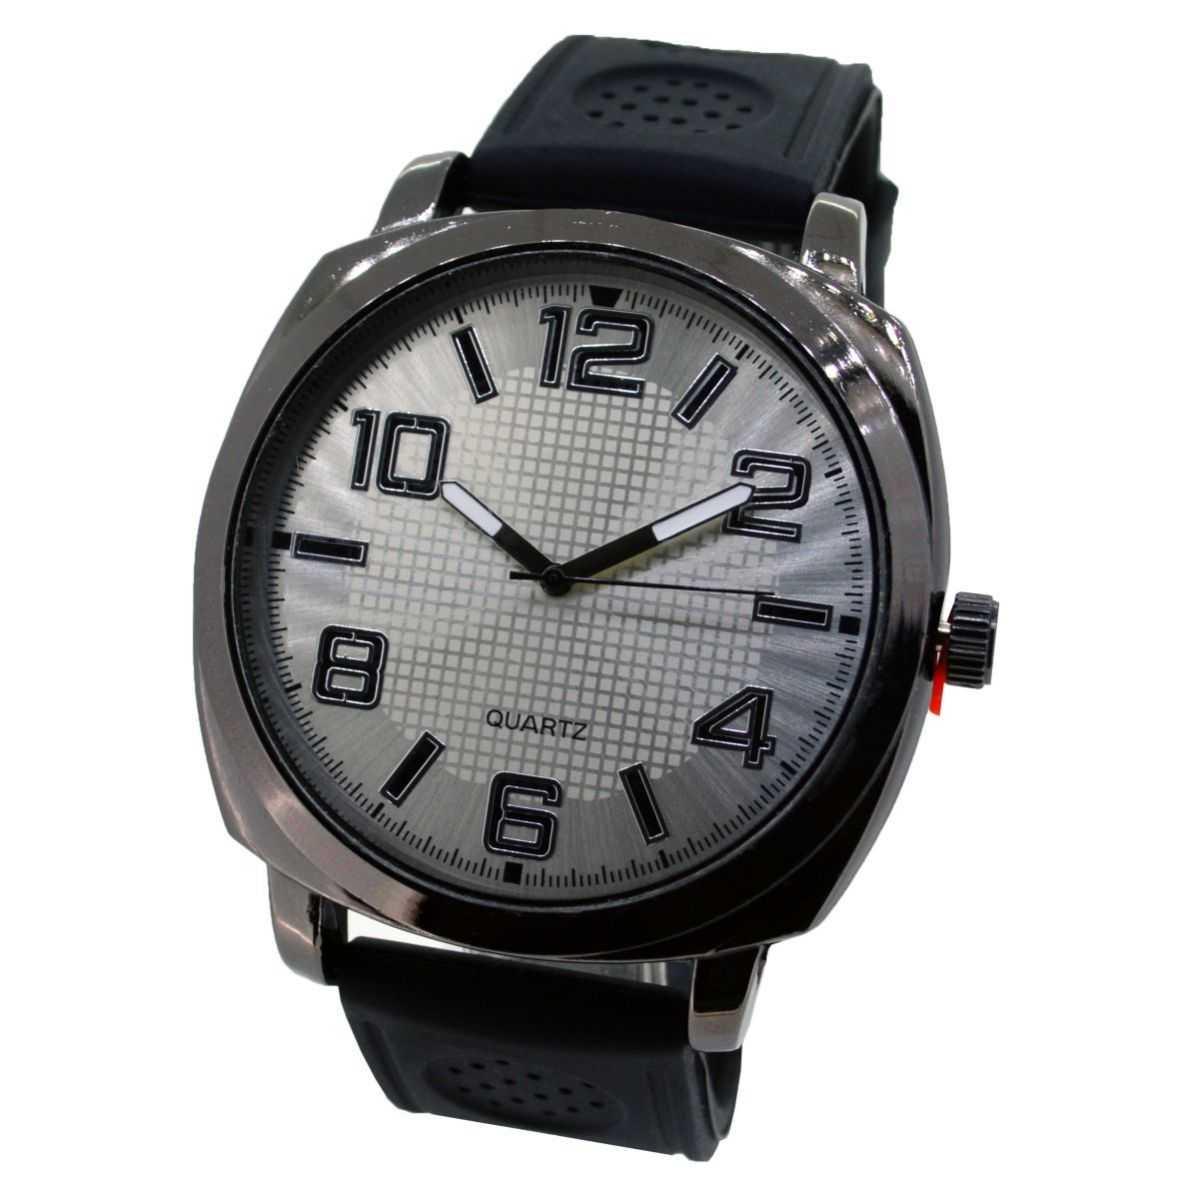 Relógio Personalizado 2464-2